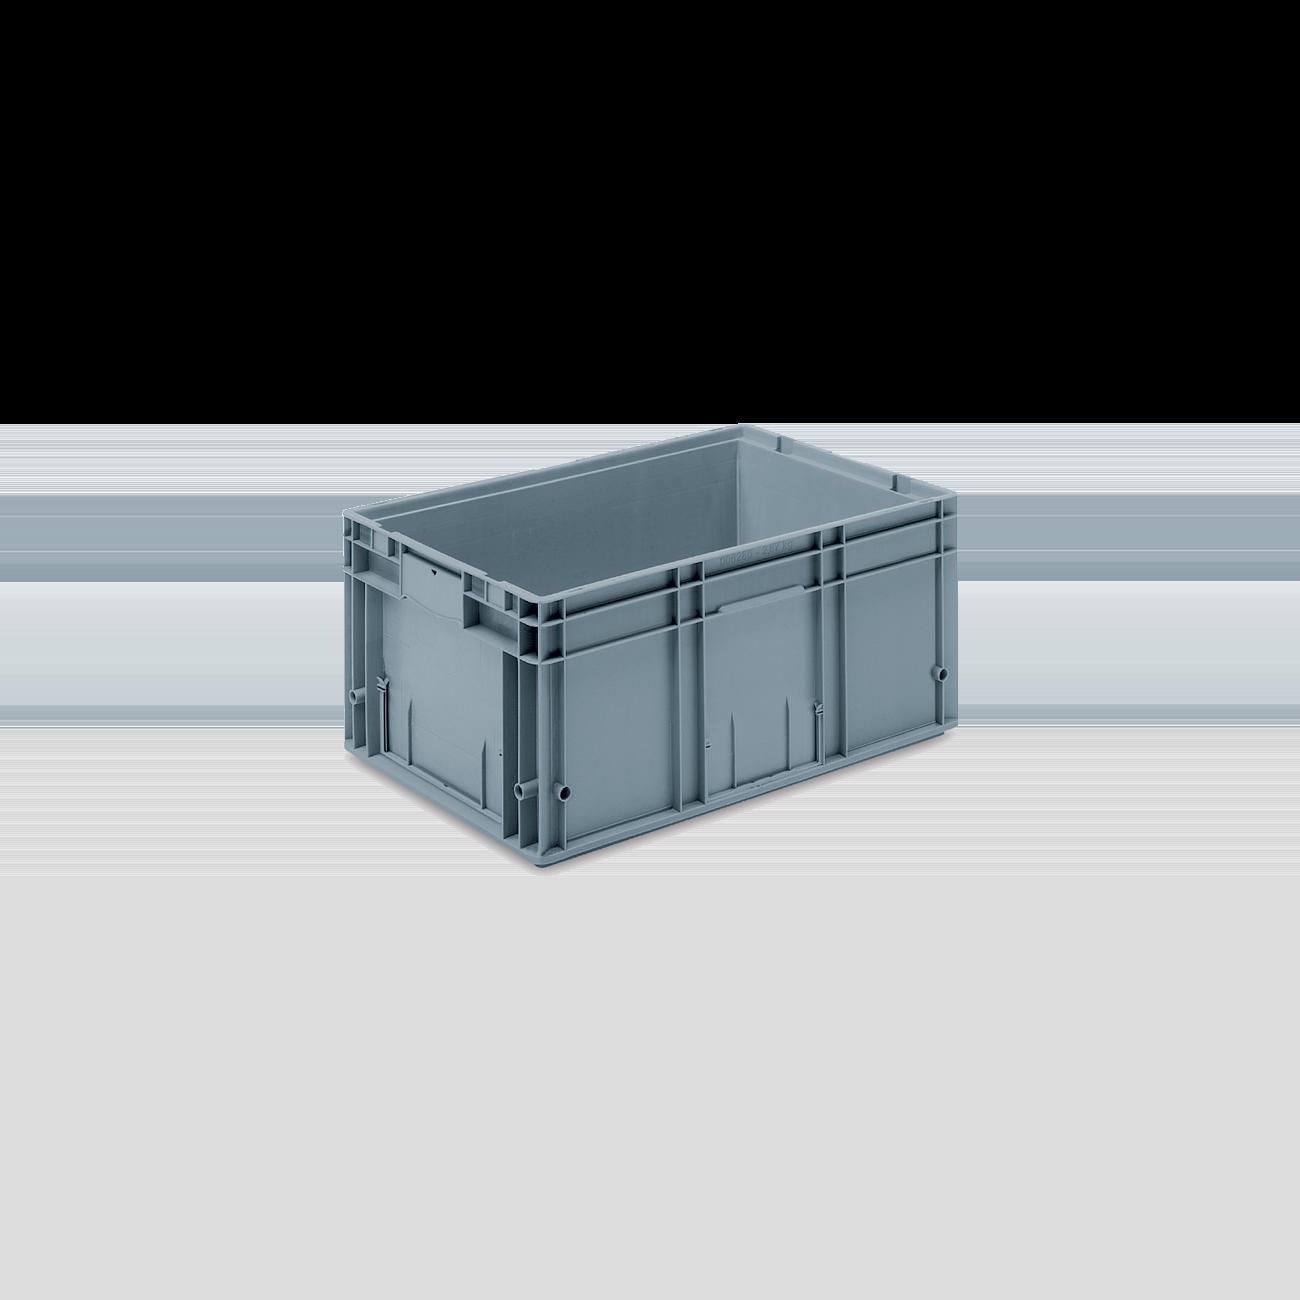 Solid Plastic Container VDA-RL-KLT 6280